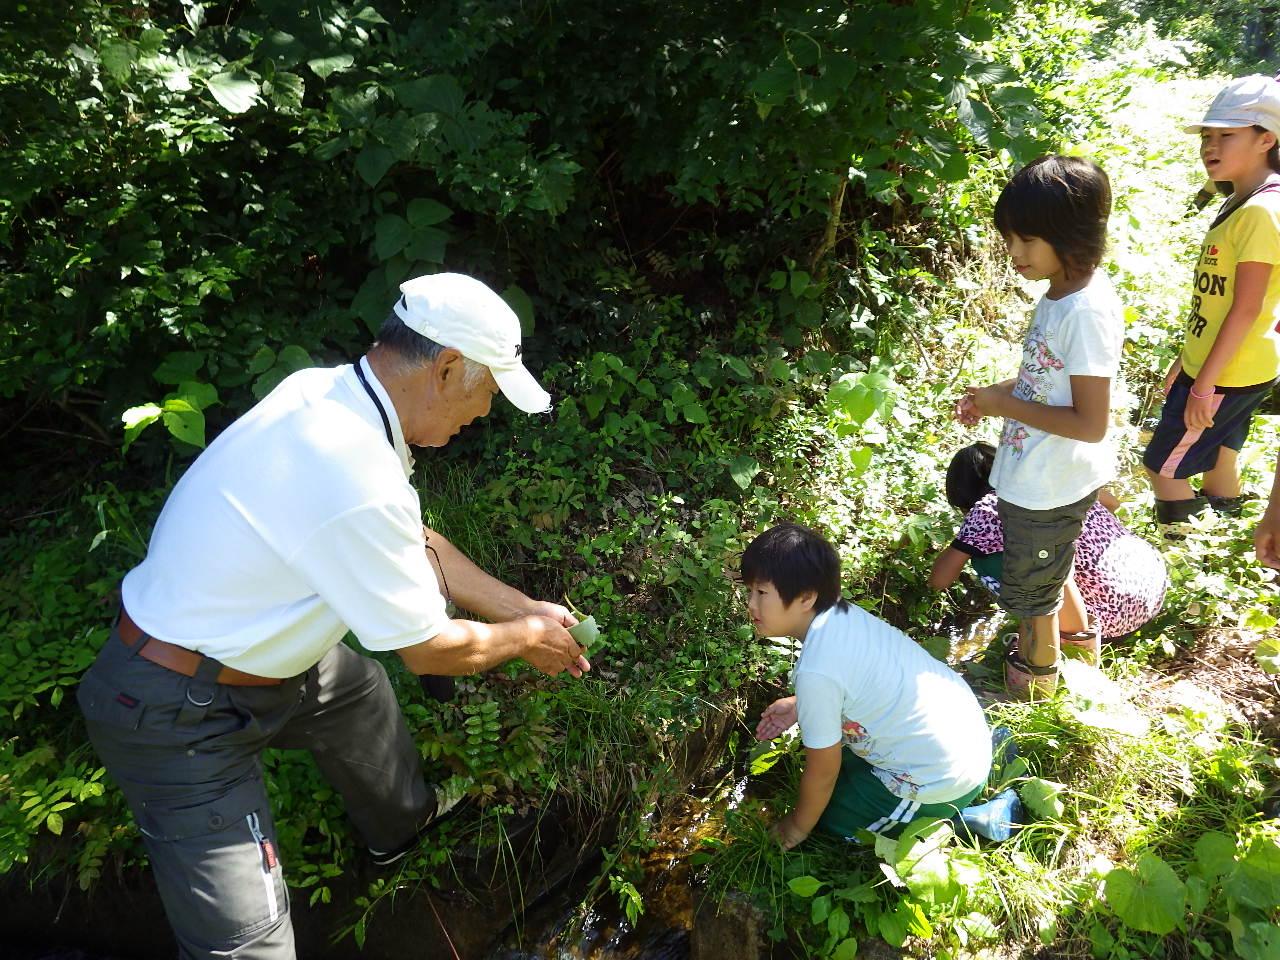 田部環境保全会での水質調査!_a0256619_18382881.jpg